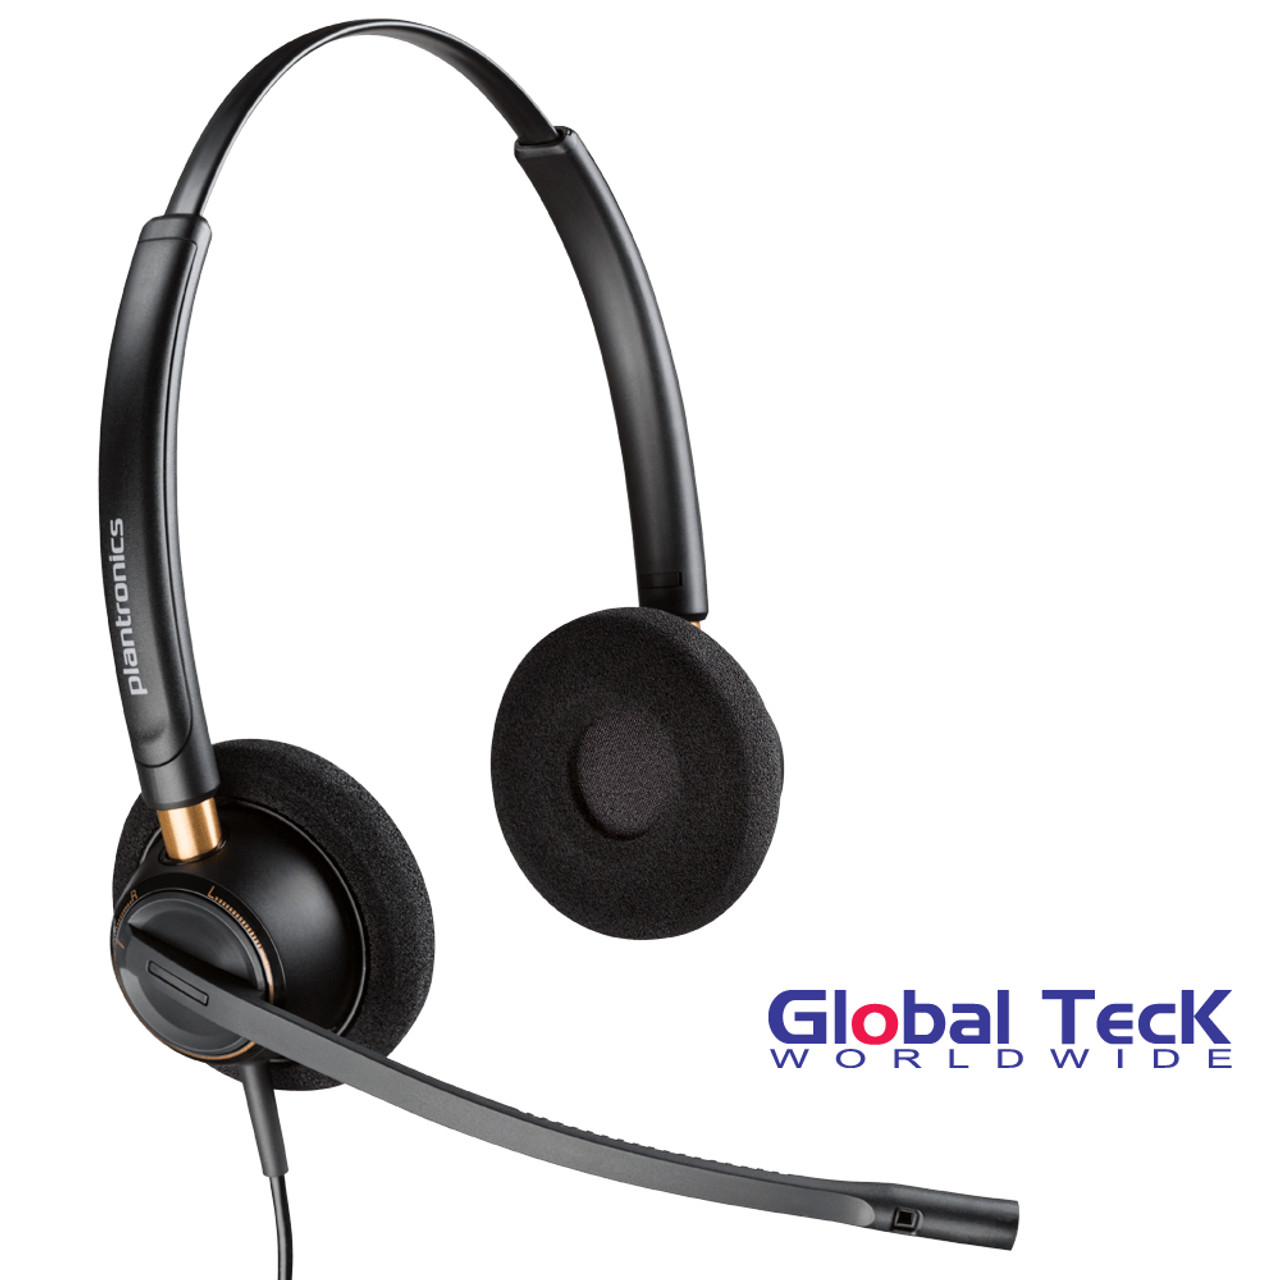 Plantronics Encore Pro Hw520 Corded Duo Headset Nortel Polycom Cisco Mitel Avaya Shoretel And Other Business Phones Requires Adapter 89434 01